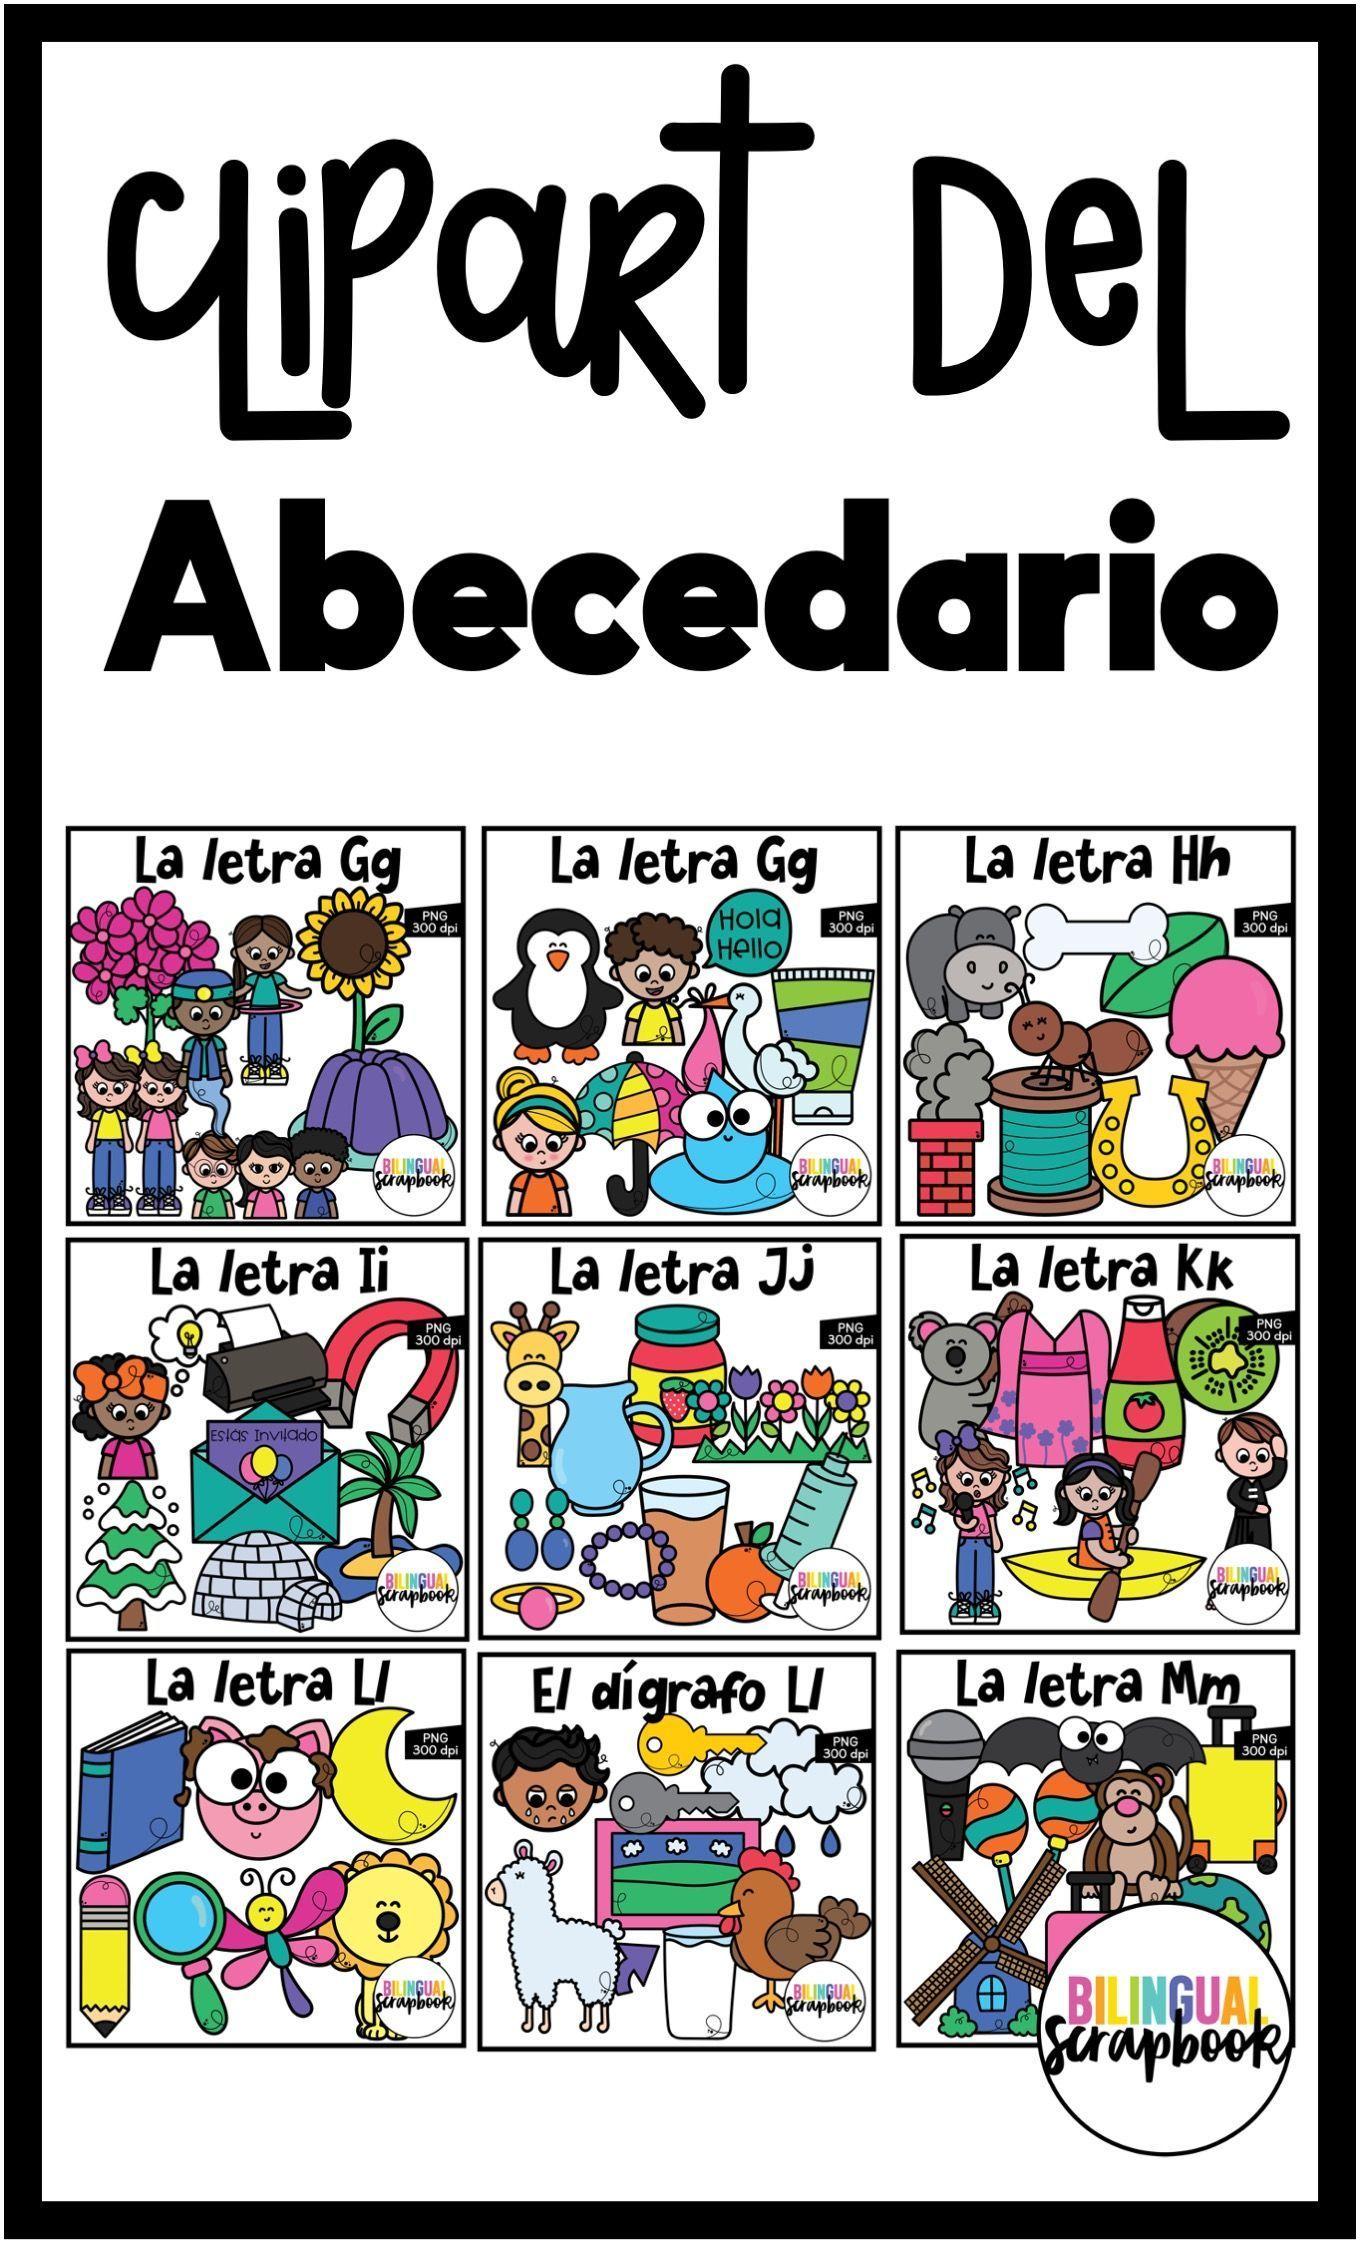 Abecedario En Espanol Spanish Alphabet Clipart Spanish Alphabet Alphabet Common Core Kindergarten Reading [ 2248 x 1365 Pixel ]